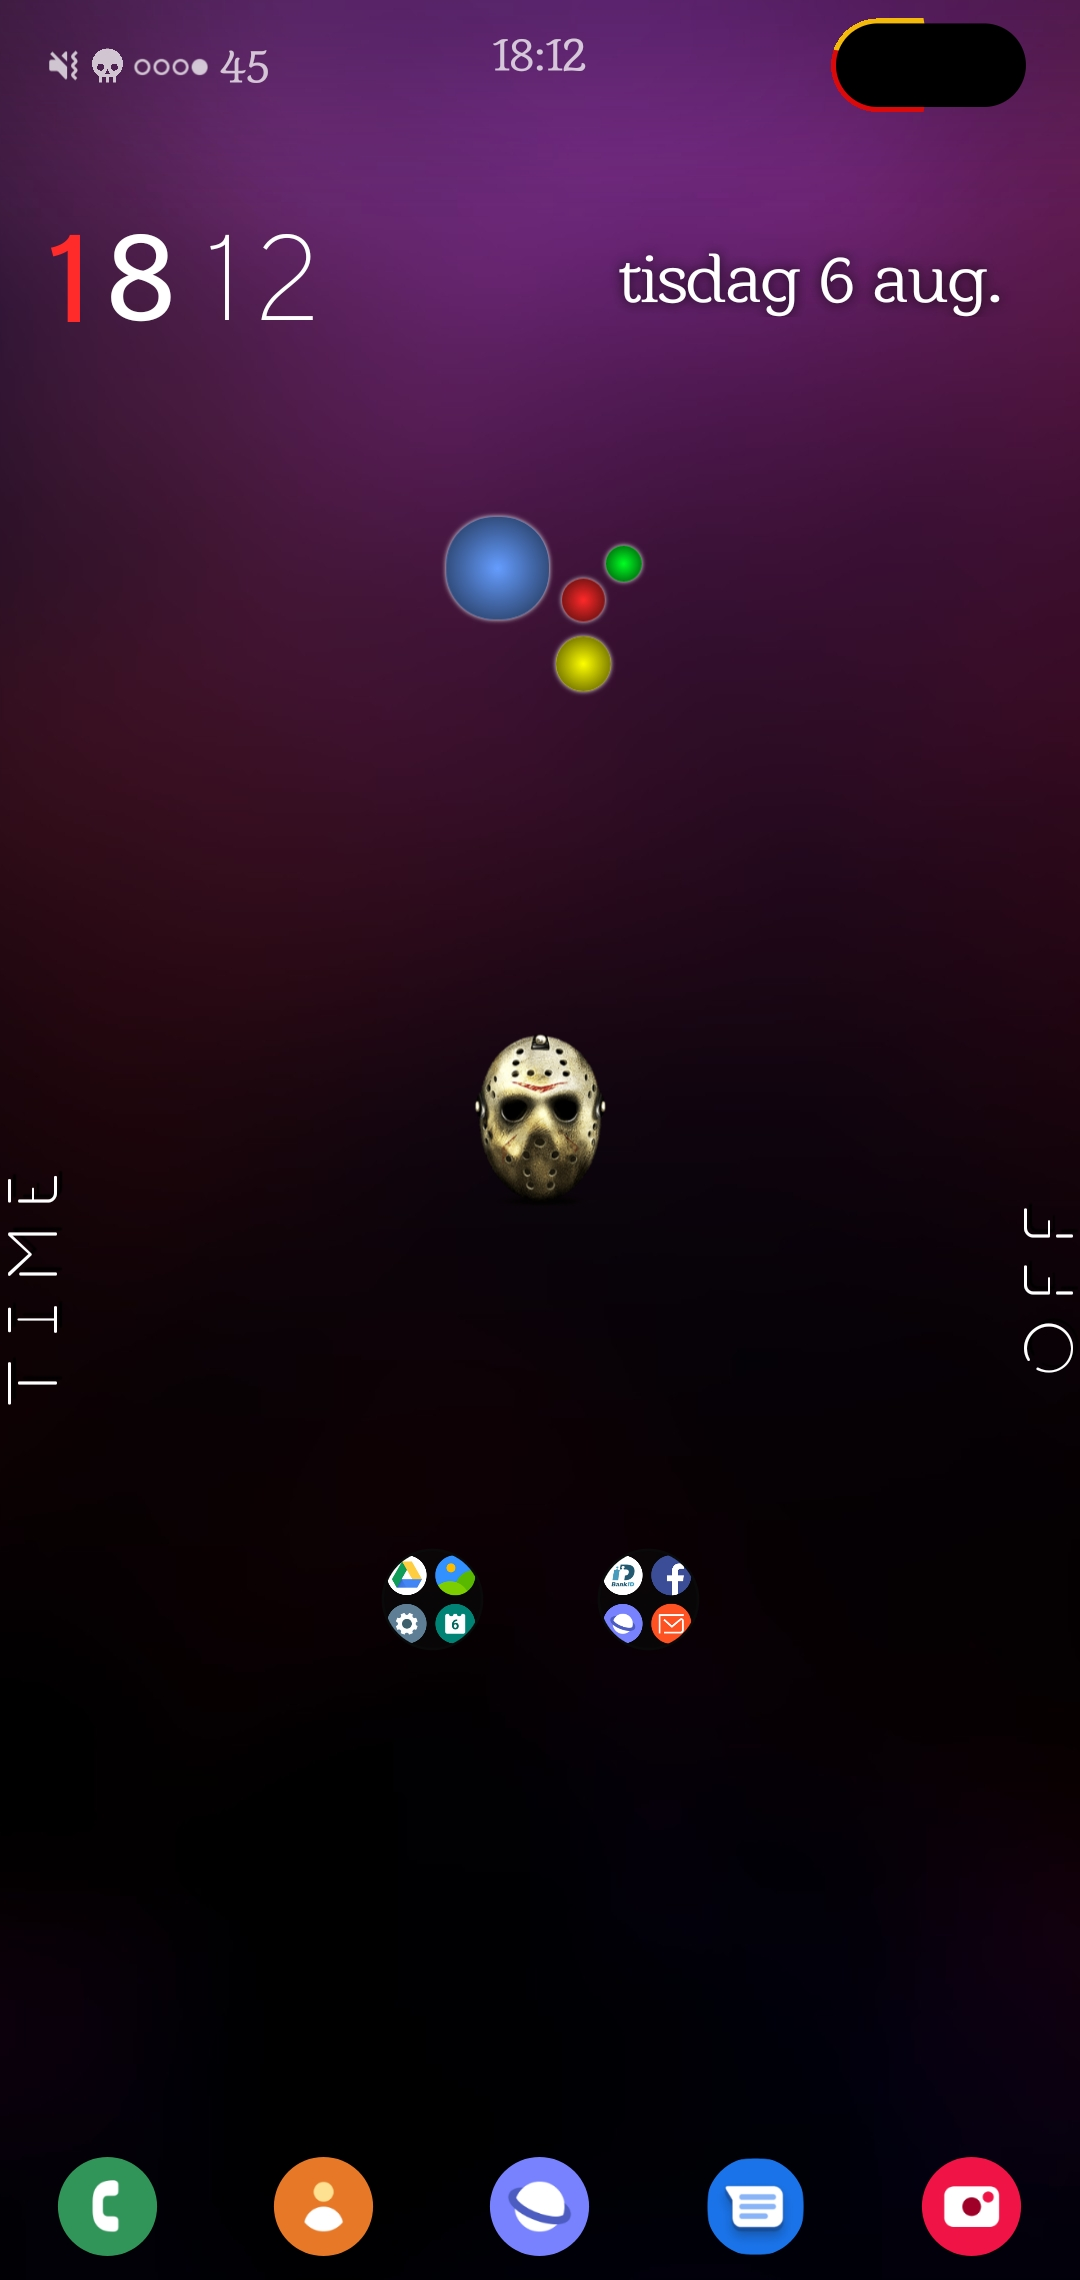 Screenshot_20190806-181205_Nova Launcher.jpg